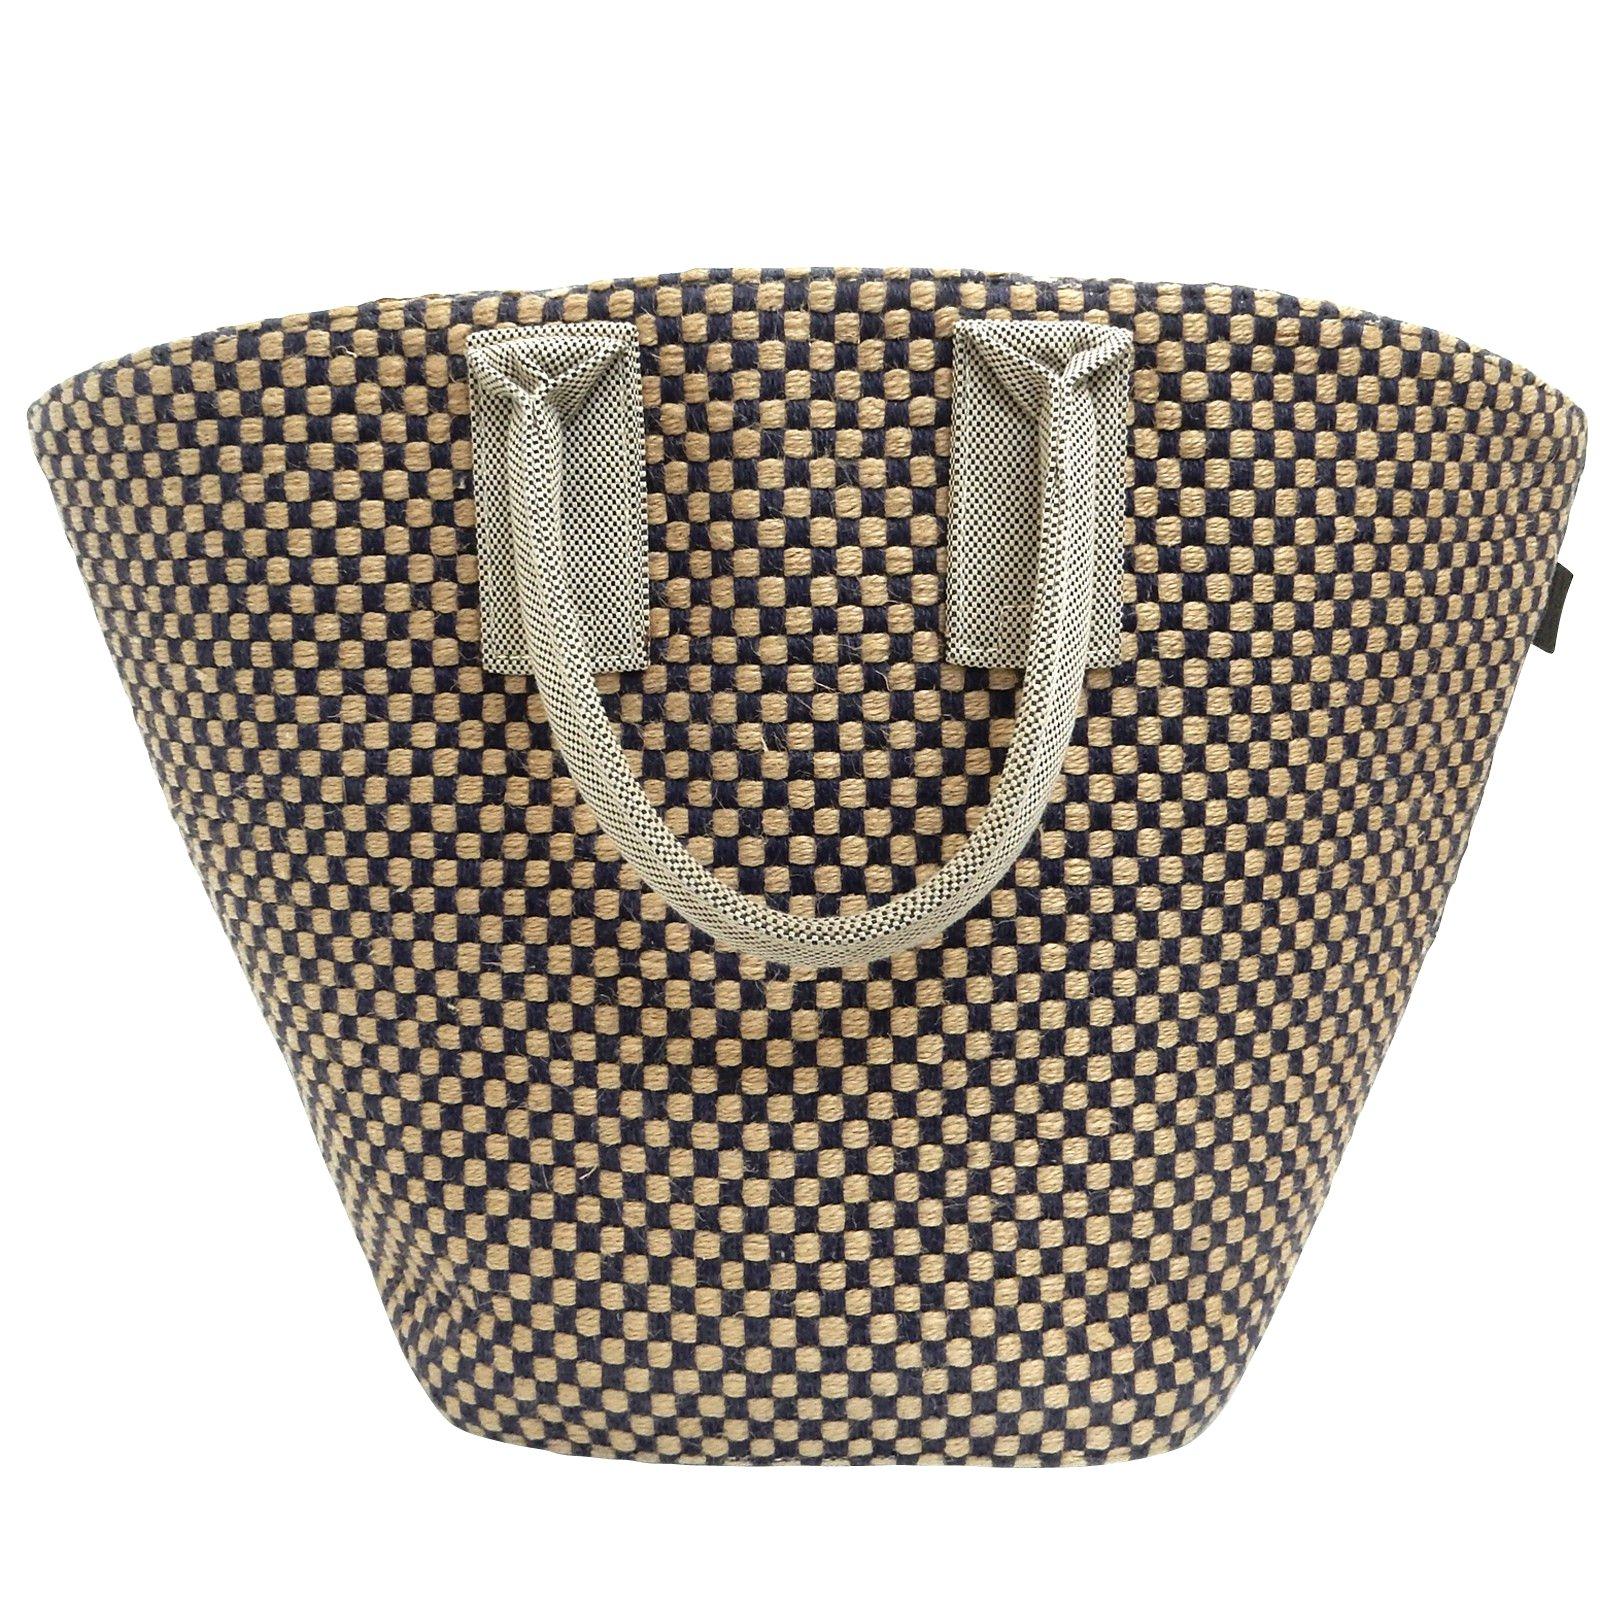 578492c637ab Hermès PM Bus Basket Handbags Other Beige ref.86870 - Joli Closet